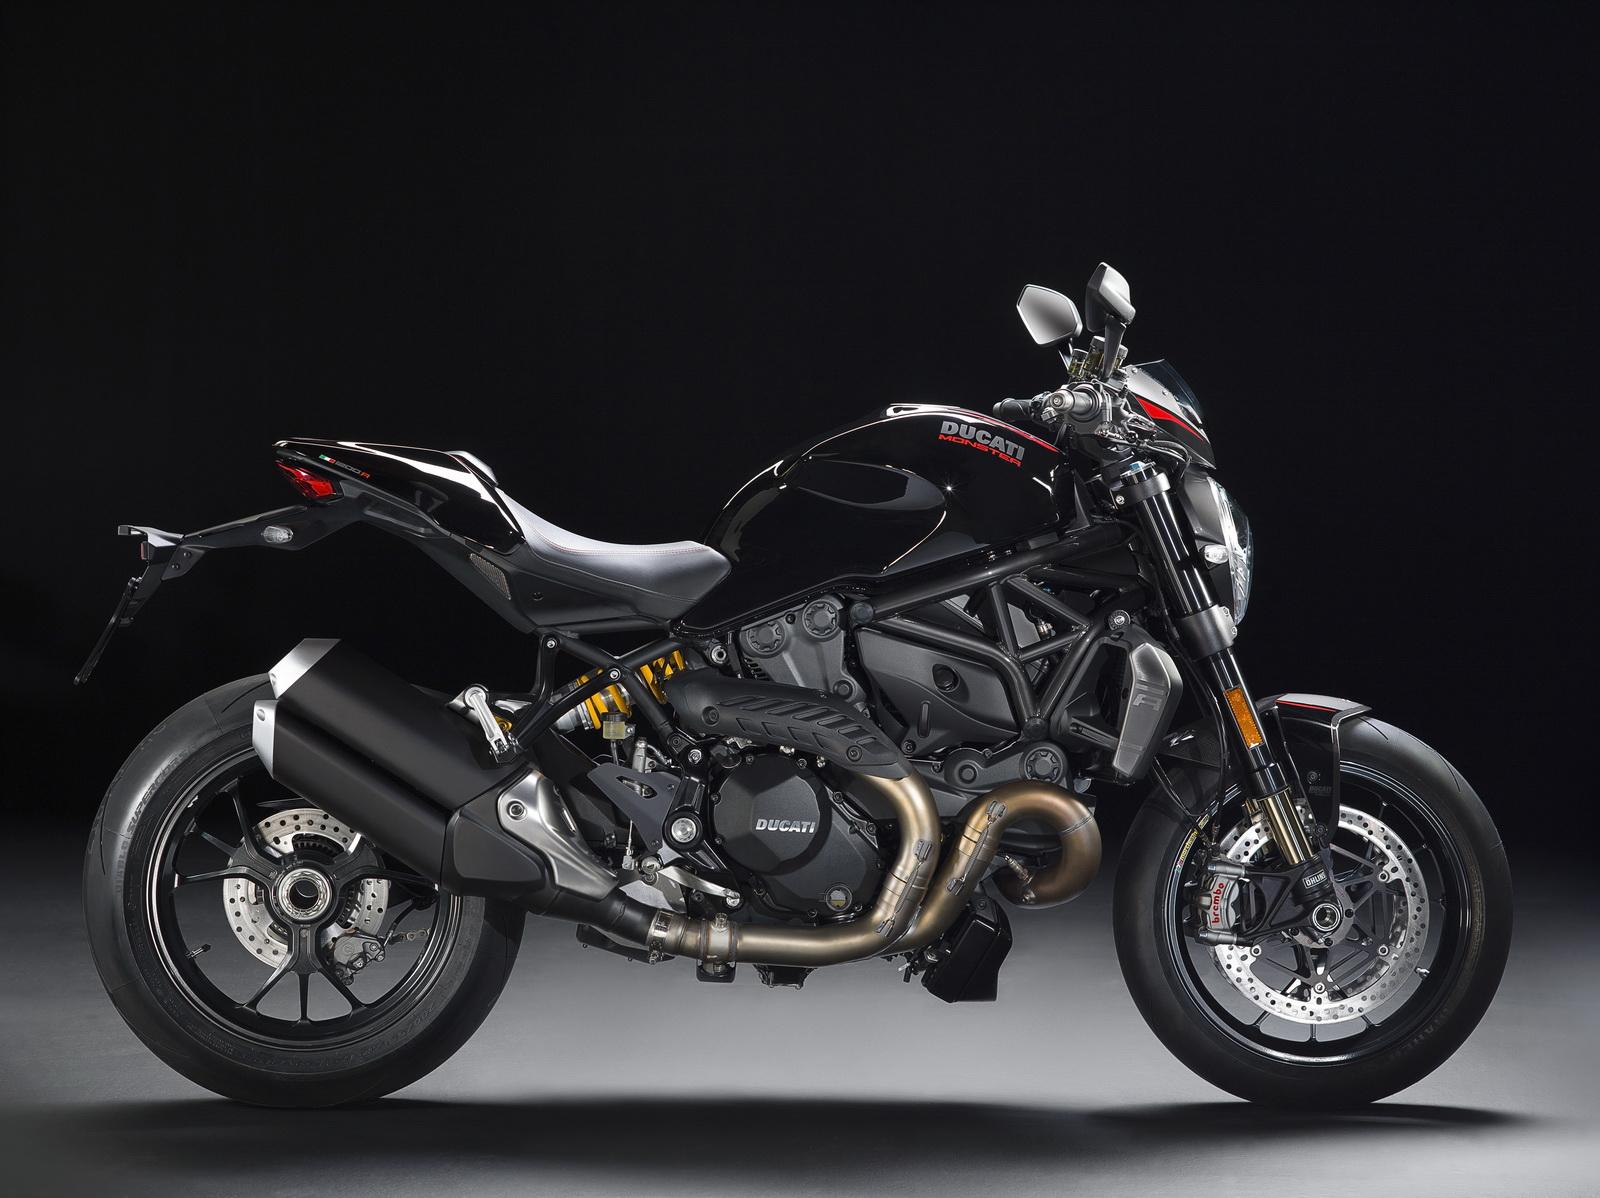 Ducati Monster 1200 R 5